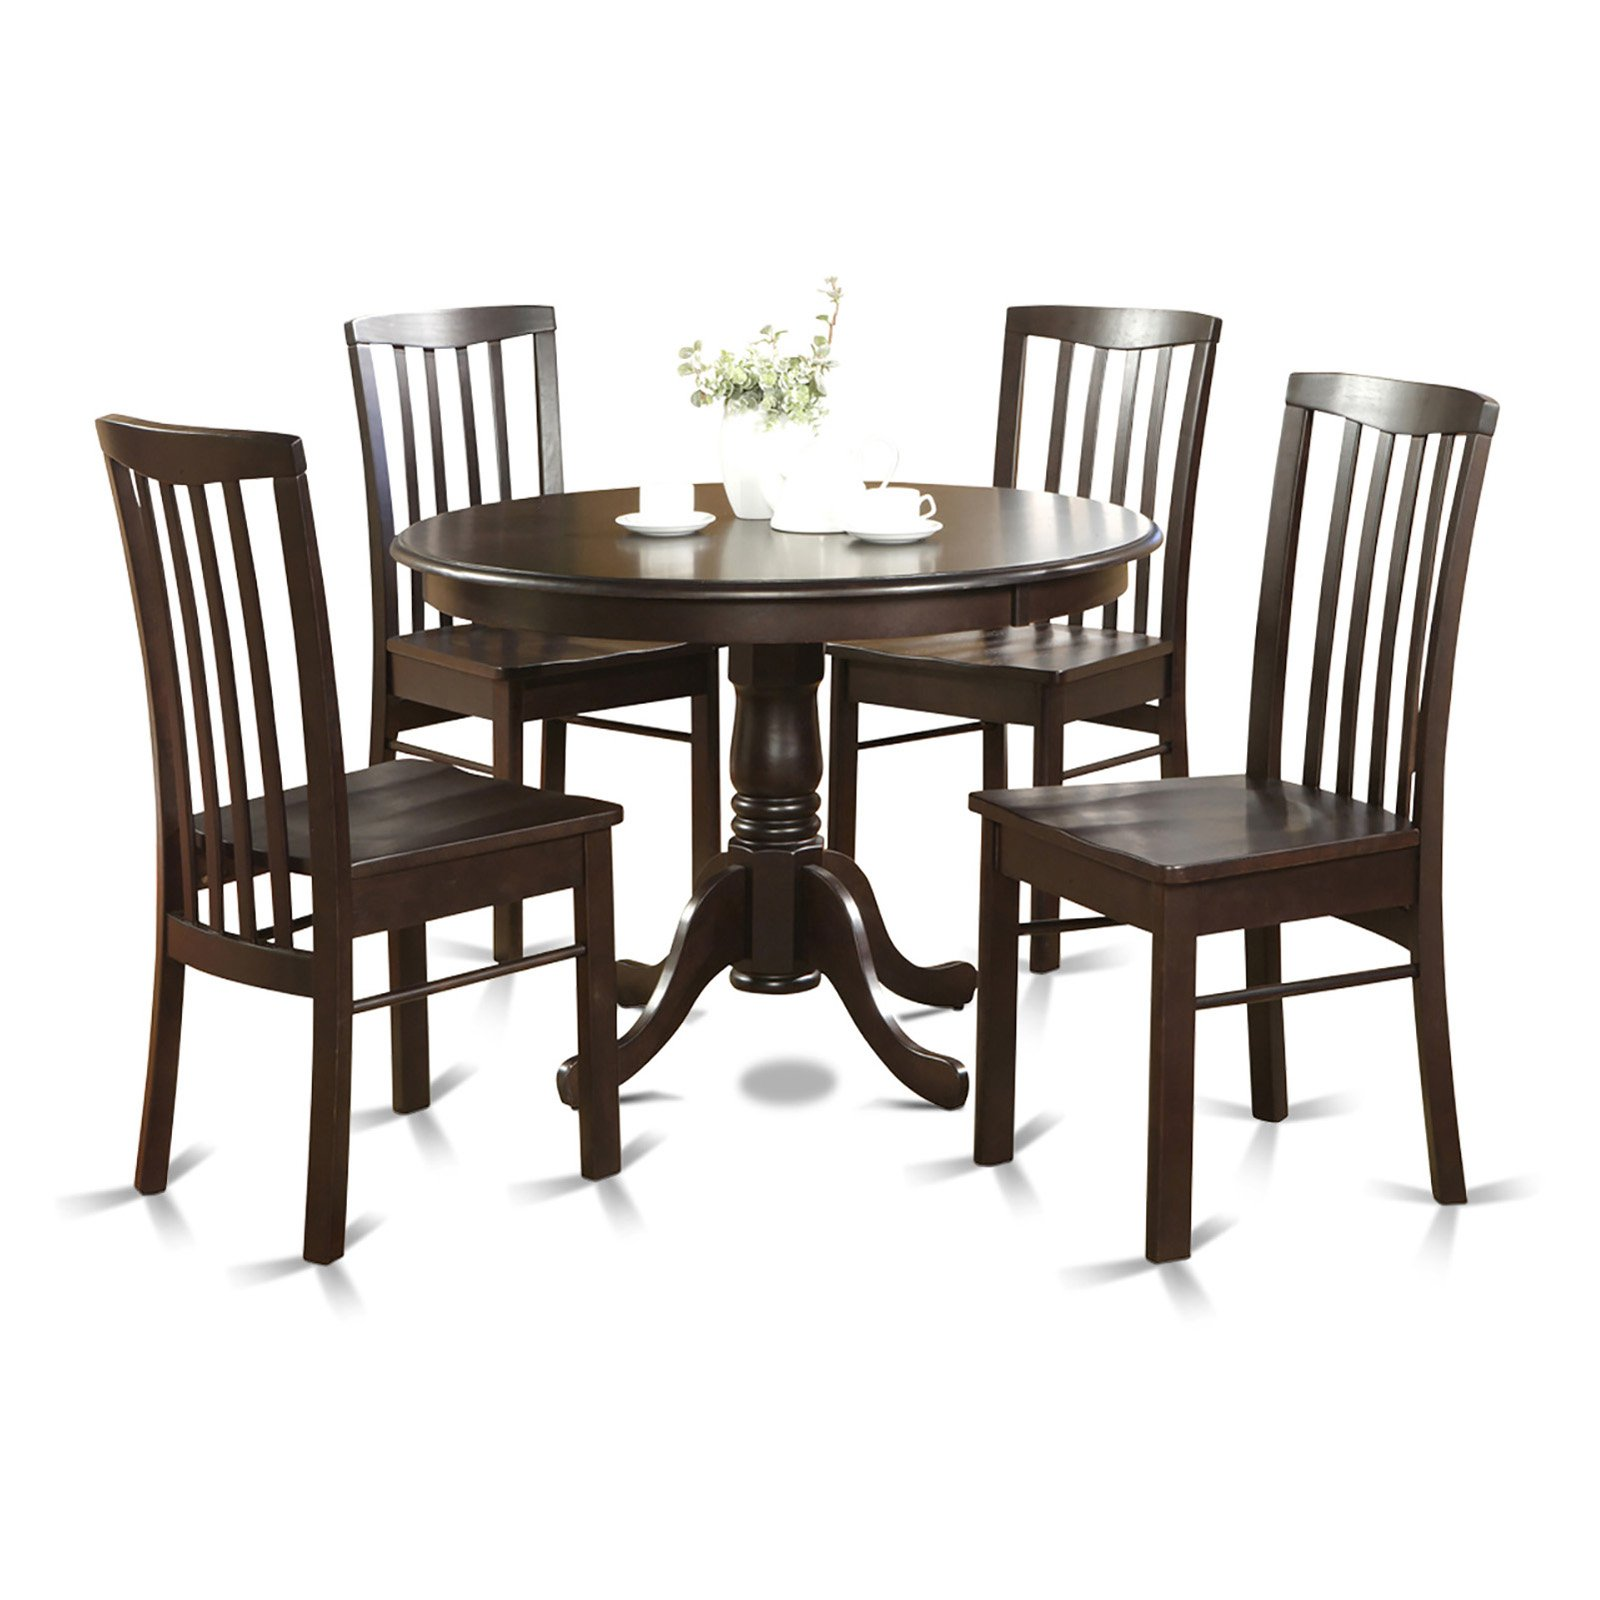 Round Kitchen Table And Chairs Walmart Kitchen Table: East West Furniture Hartland 5 Piece Round Pedestal Dining